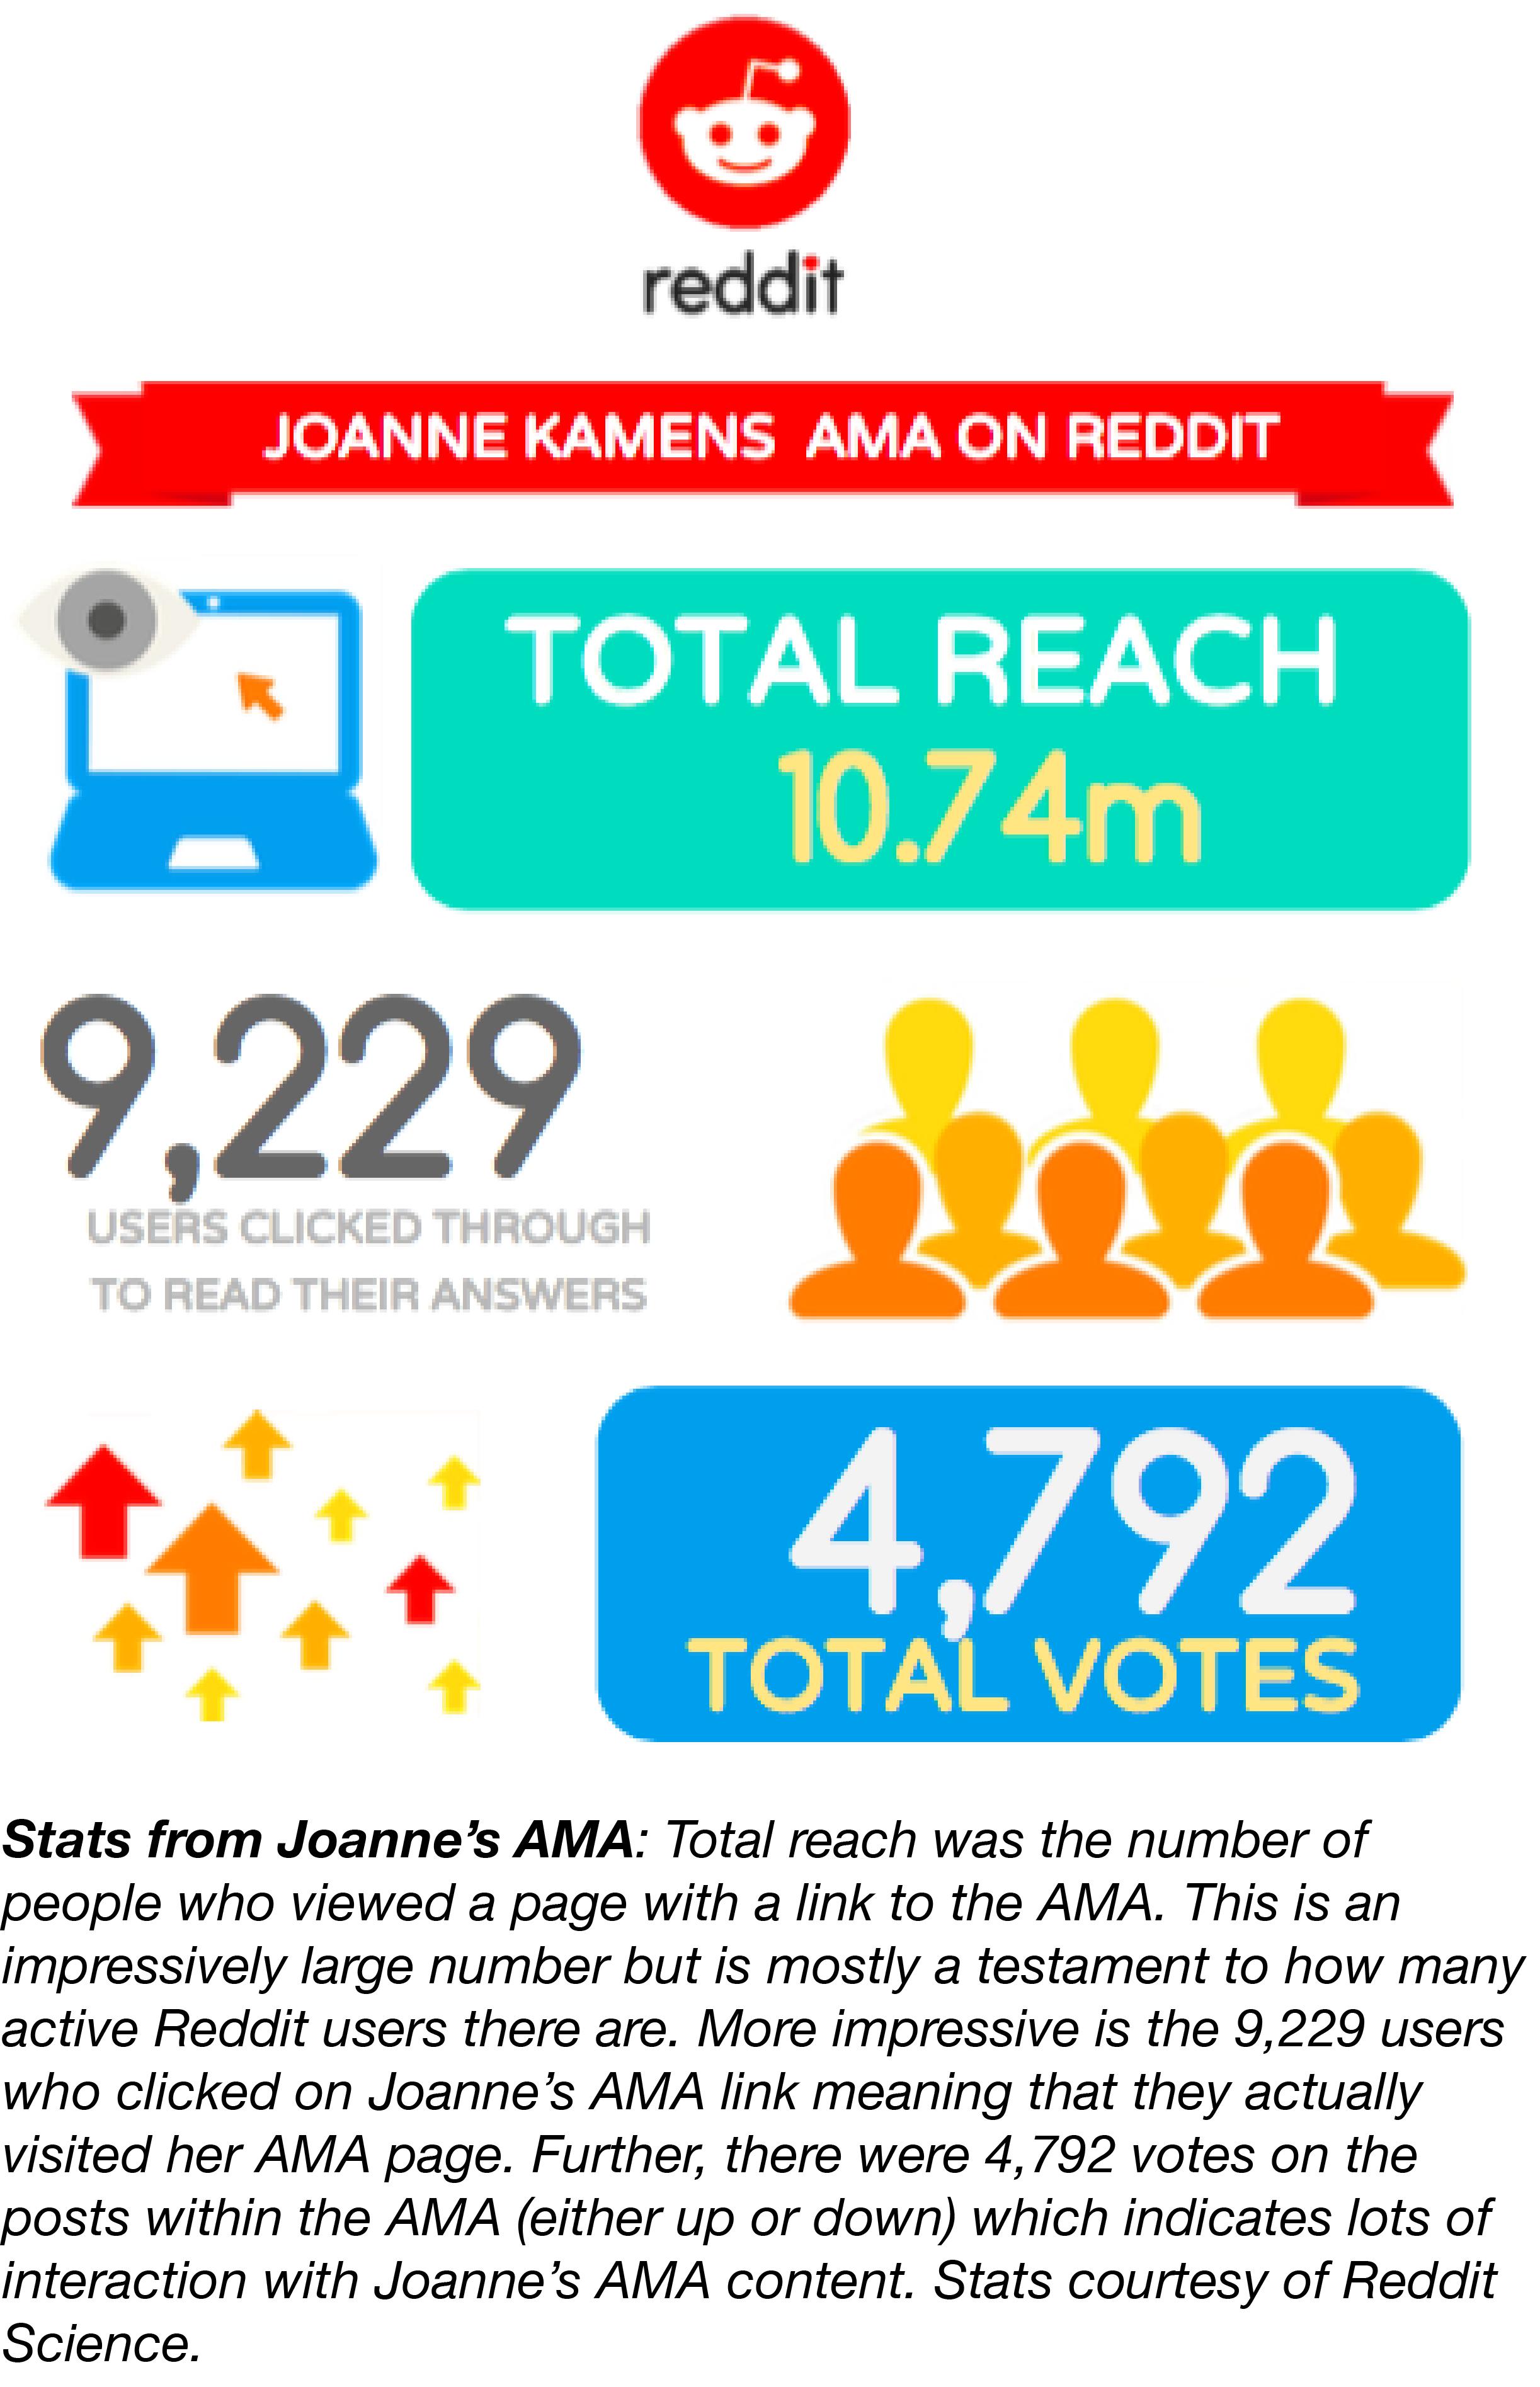 Joanne Reddit AMA Stats